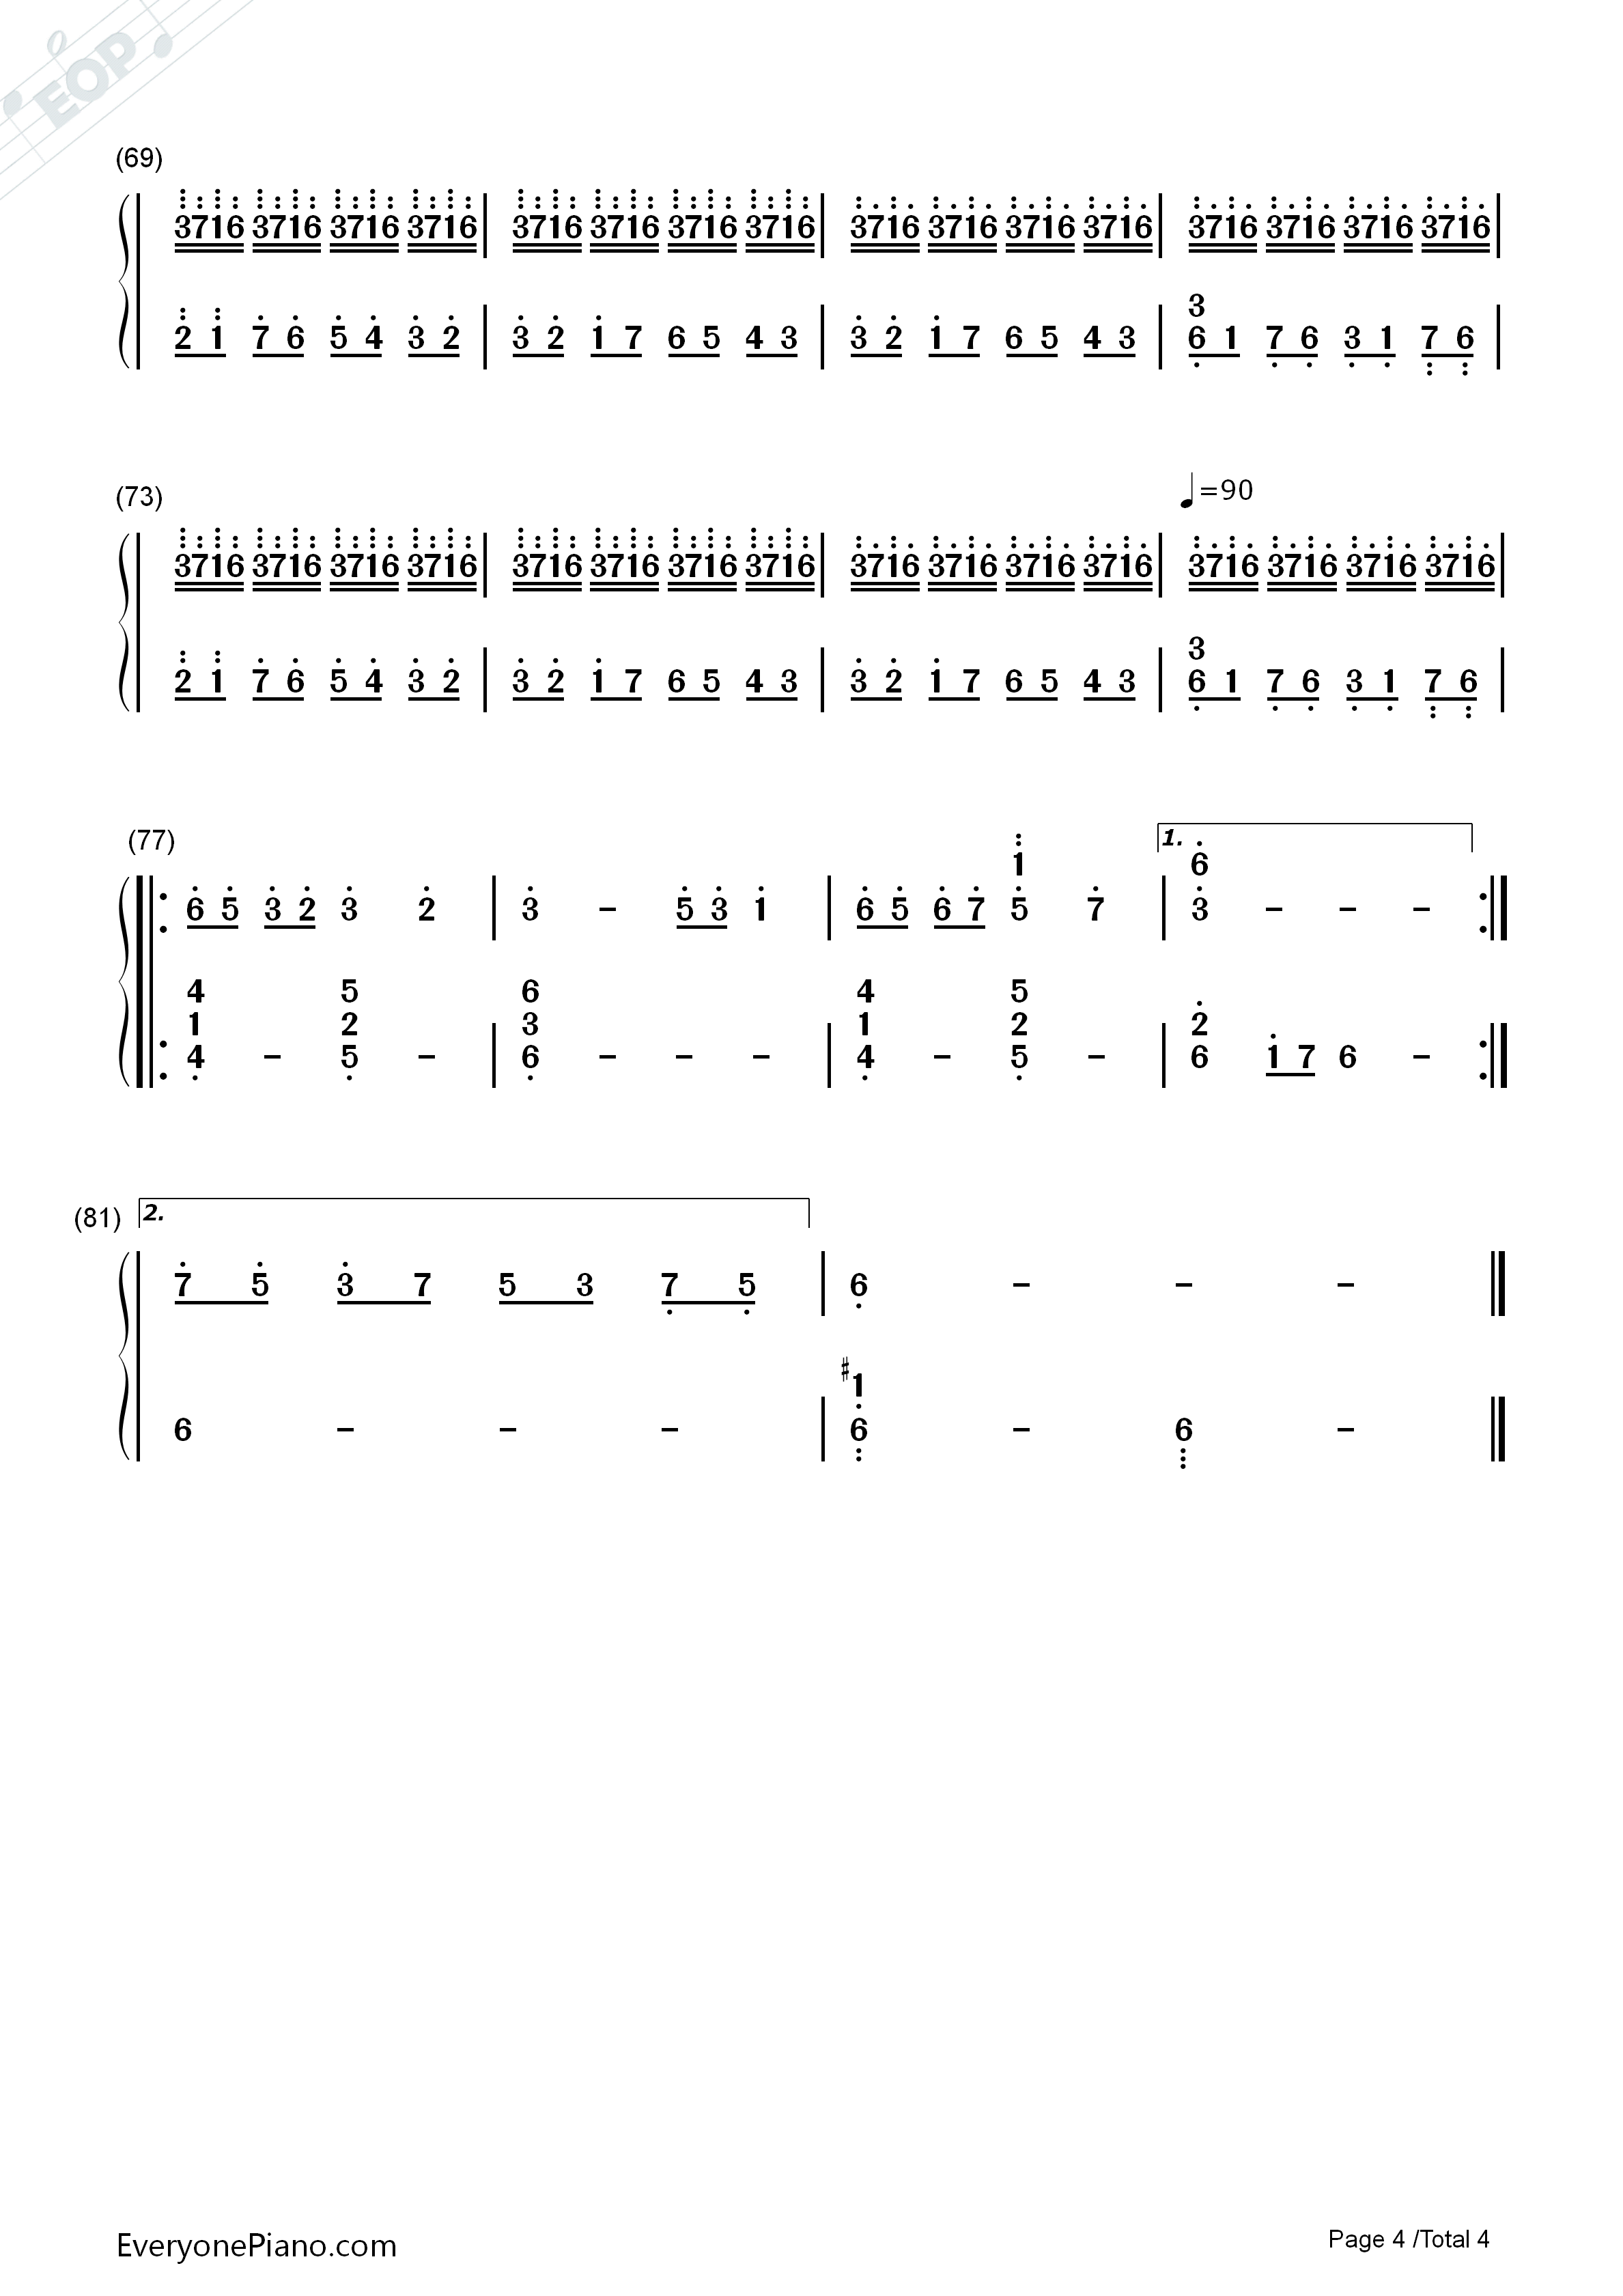 钢琴曲谱 轻音乐 情书-luv letter 情书-luv letter双手简谱预览4  }